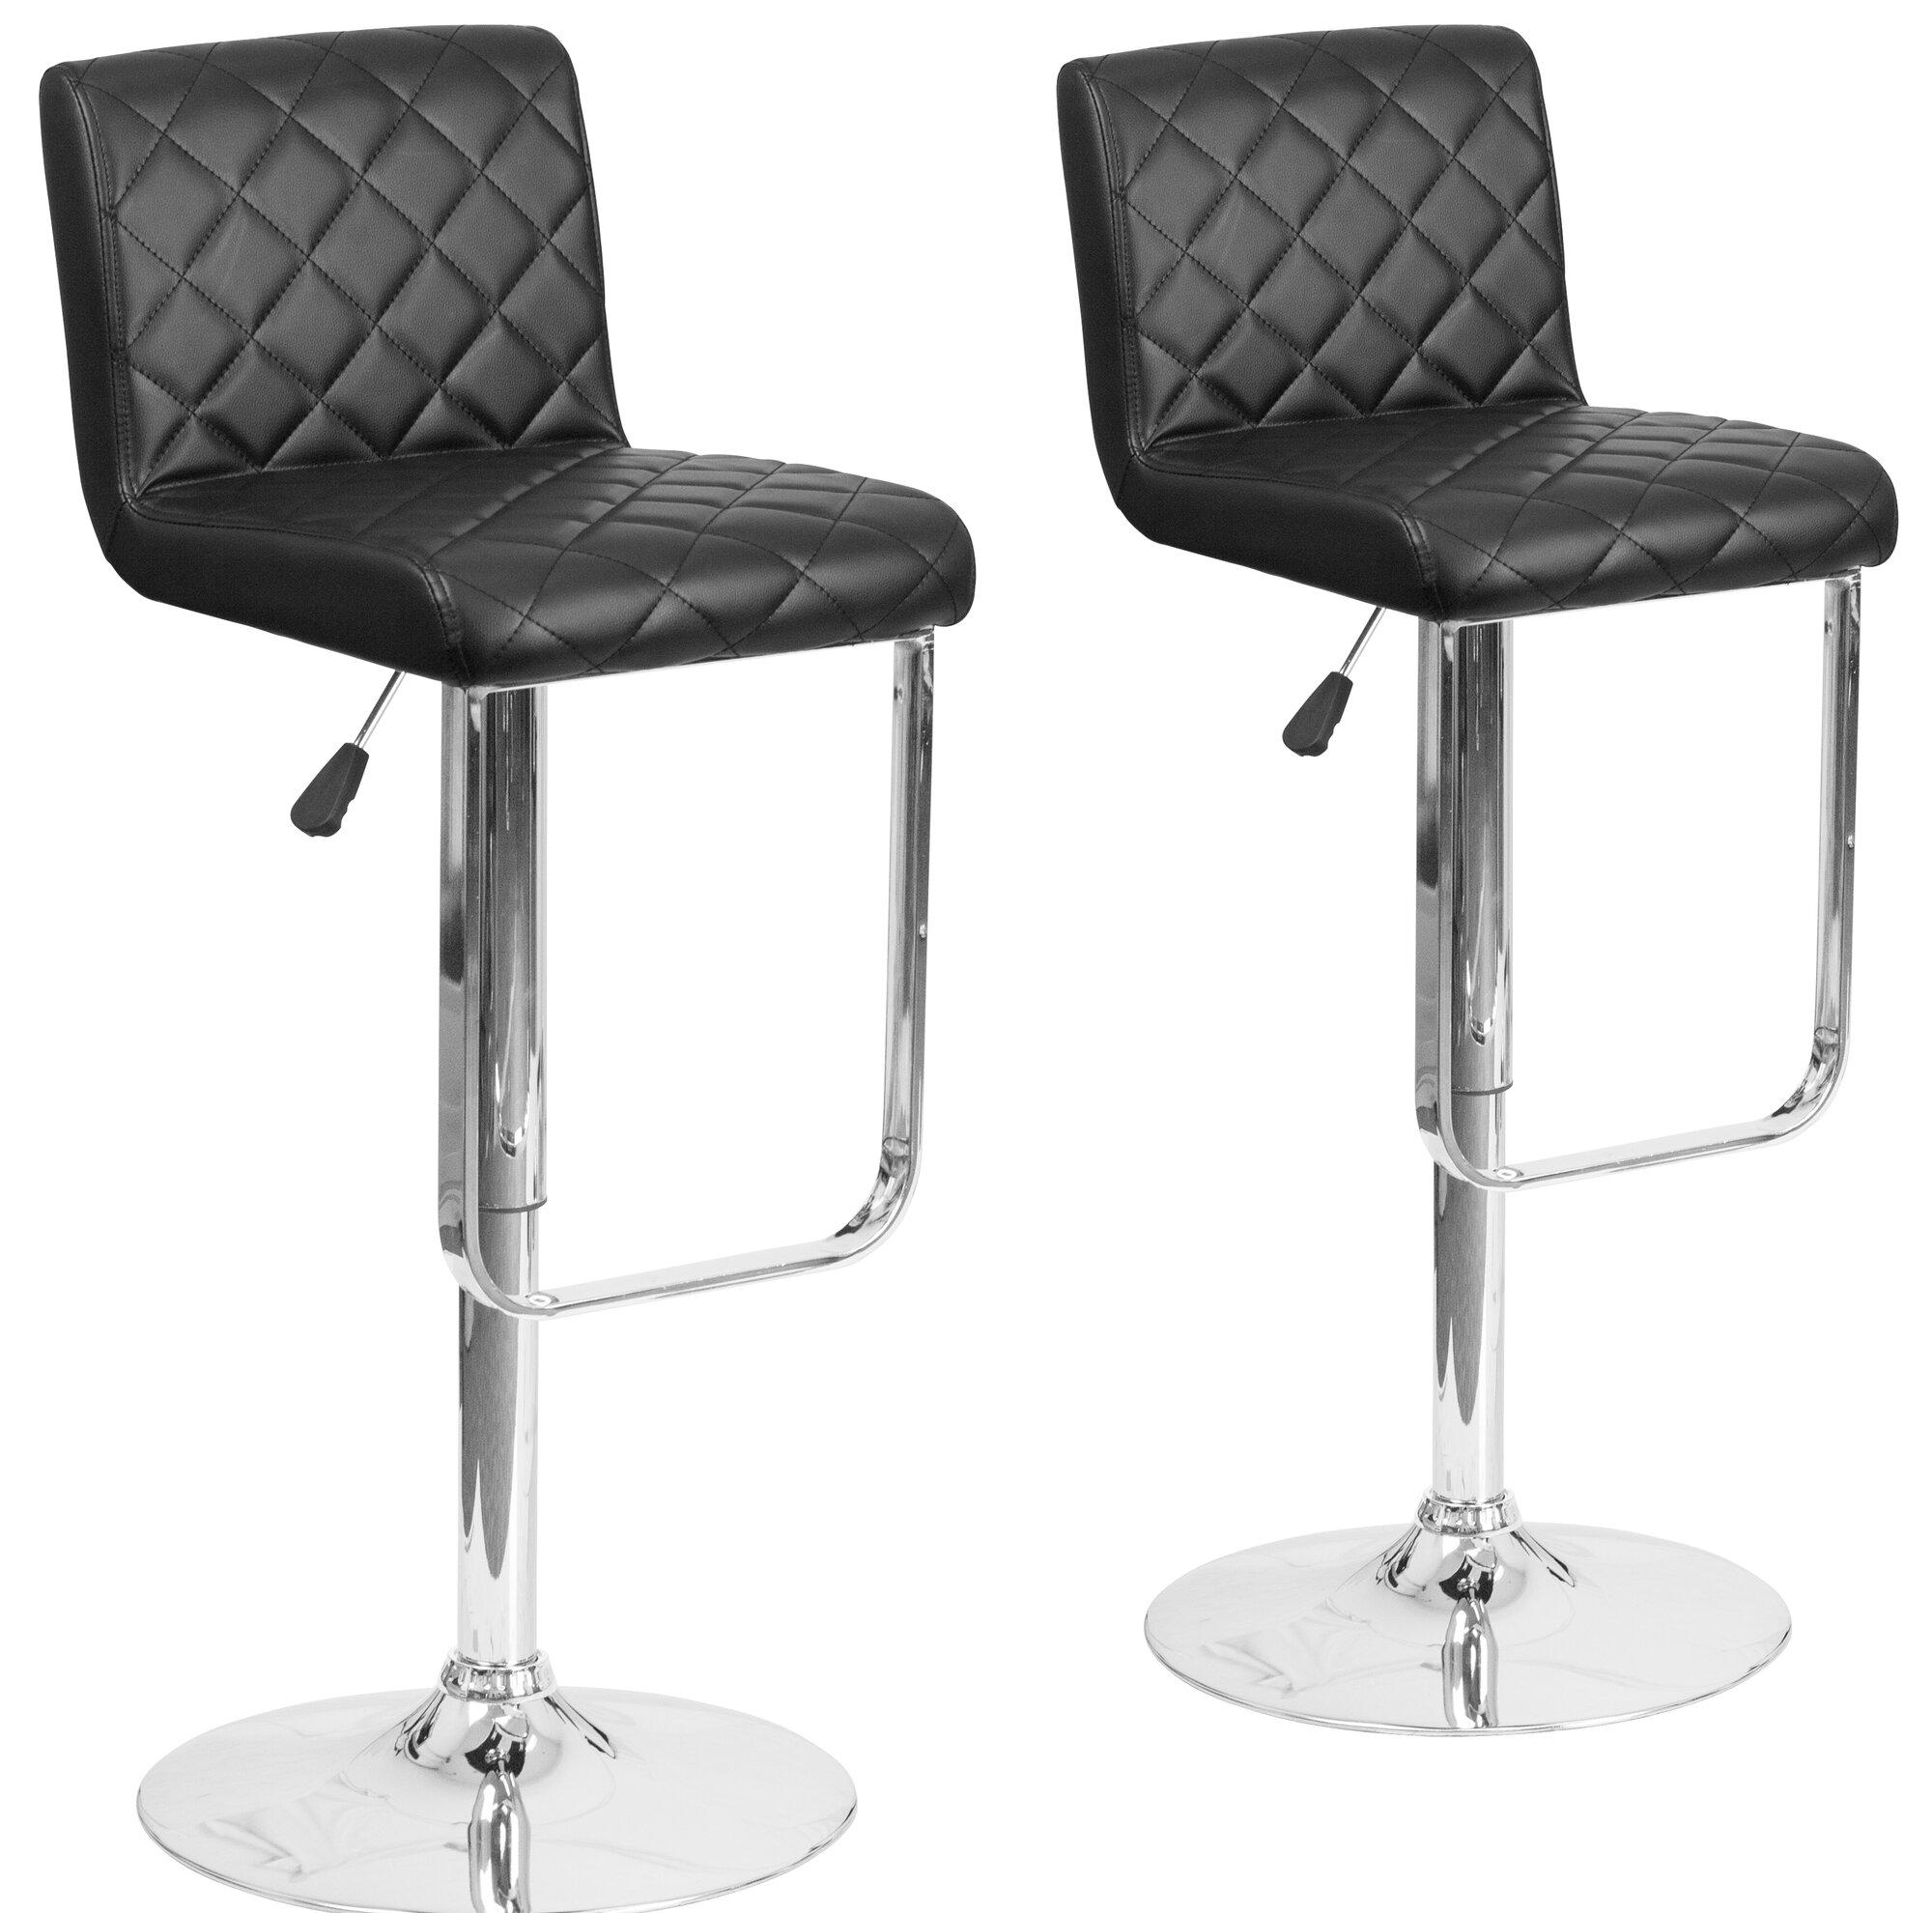 Bar Stool Set Of 2 Adjustable Height Seat Chair Swivel: Flash Furniture Adjustable Height Swivel Bar Stool Set Of 2